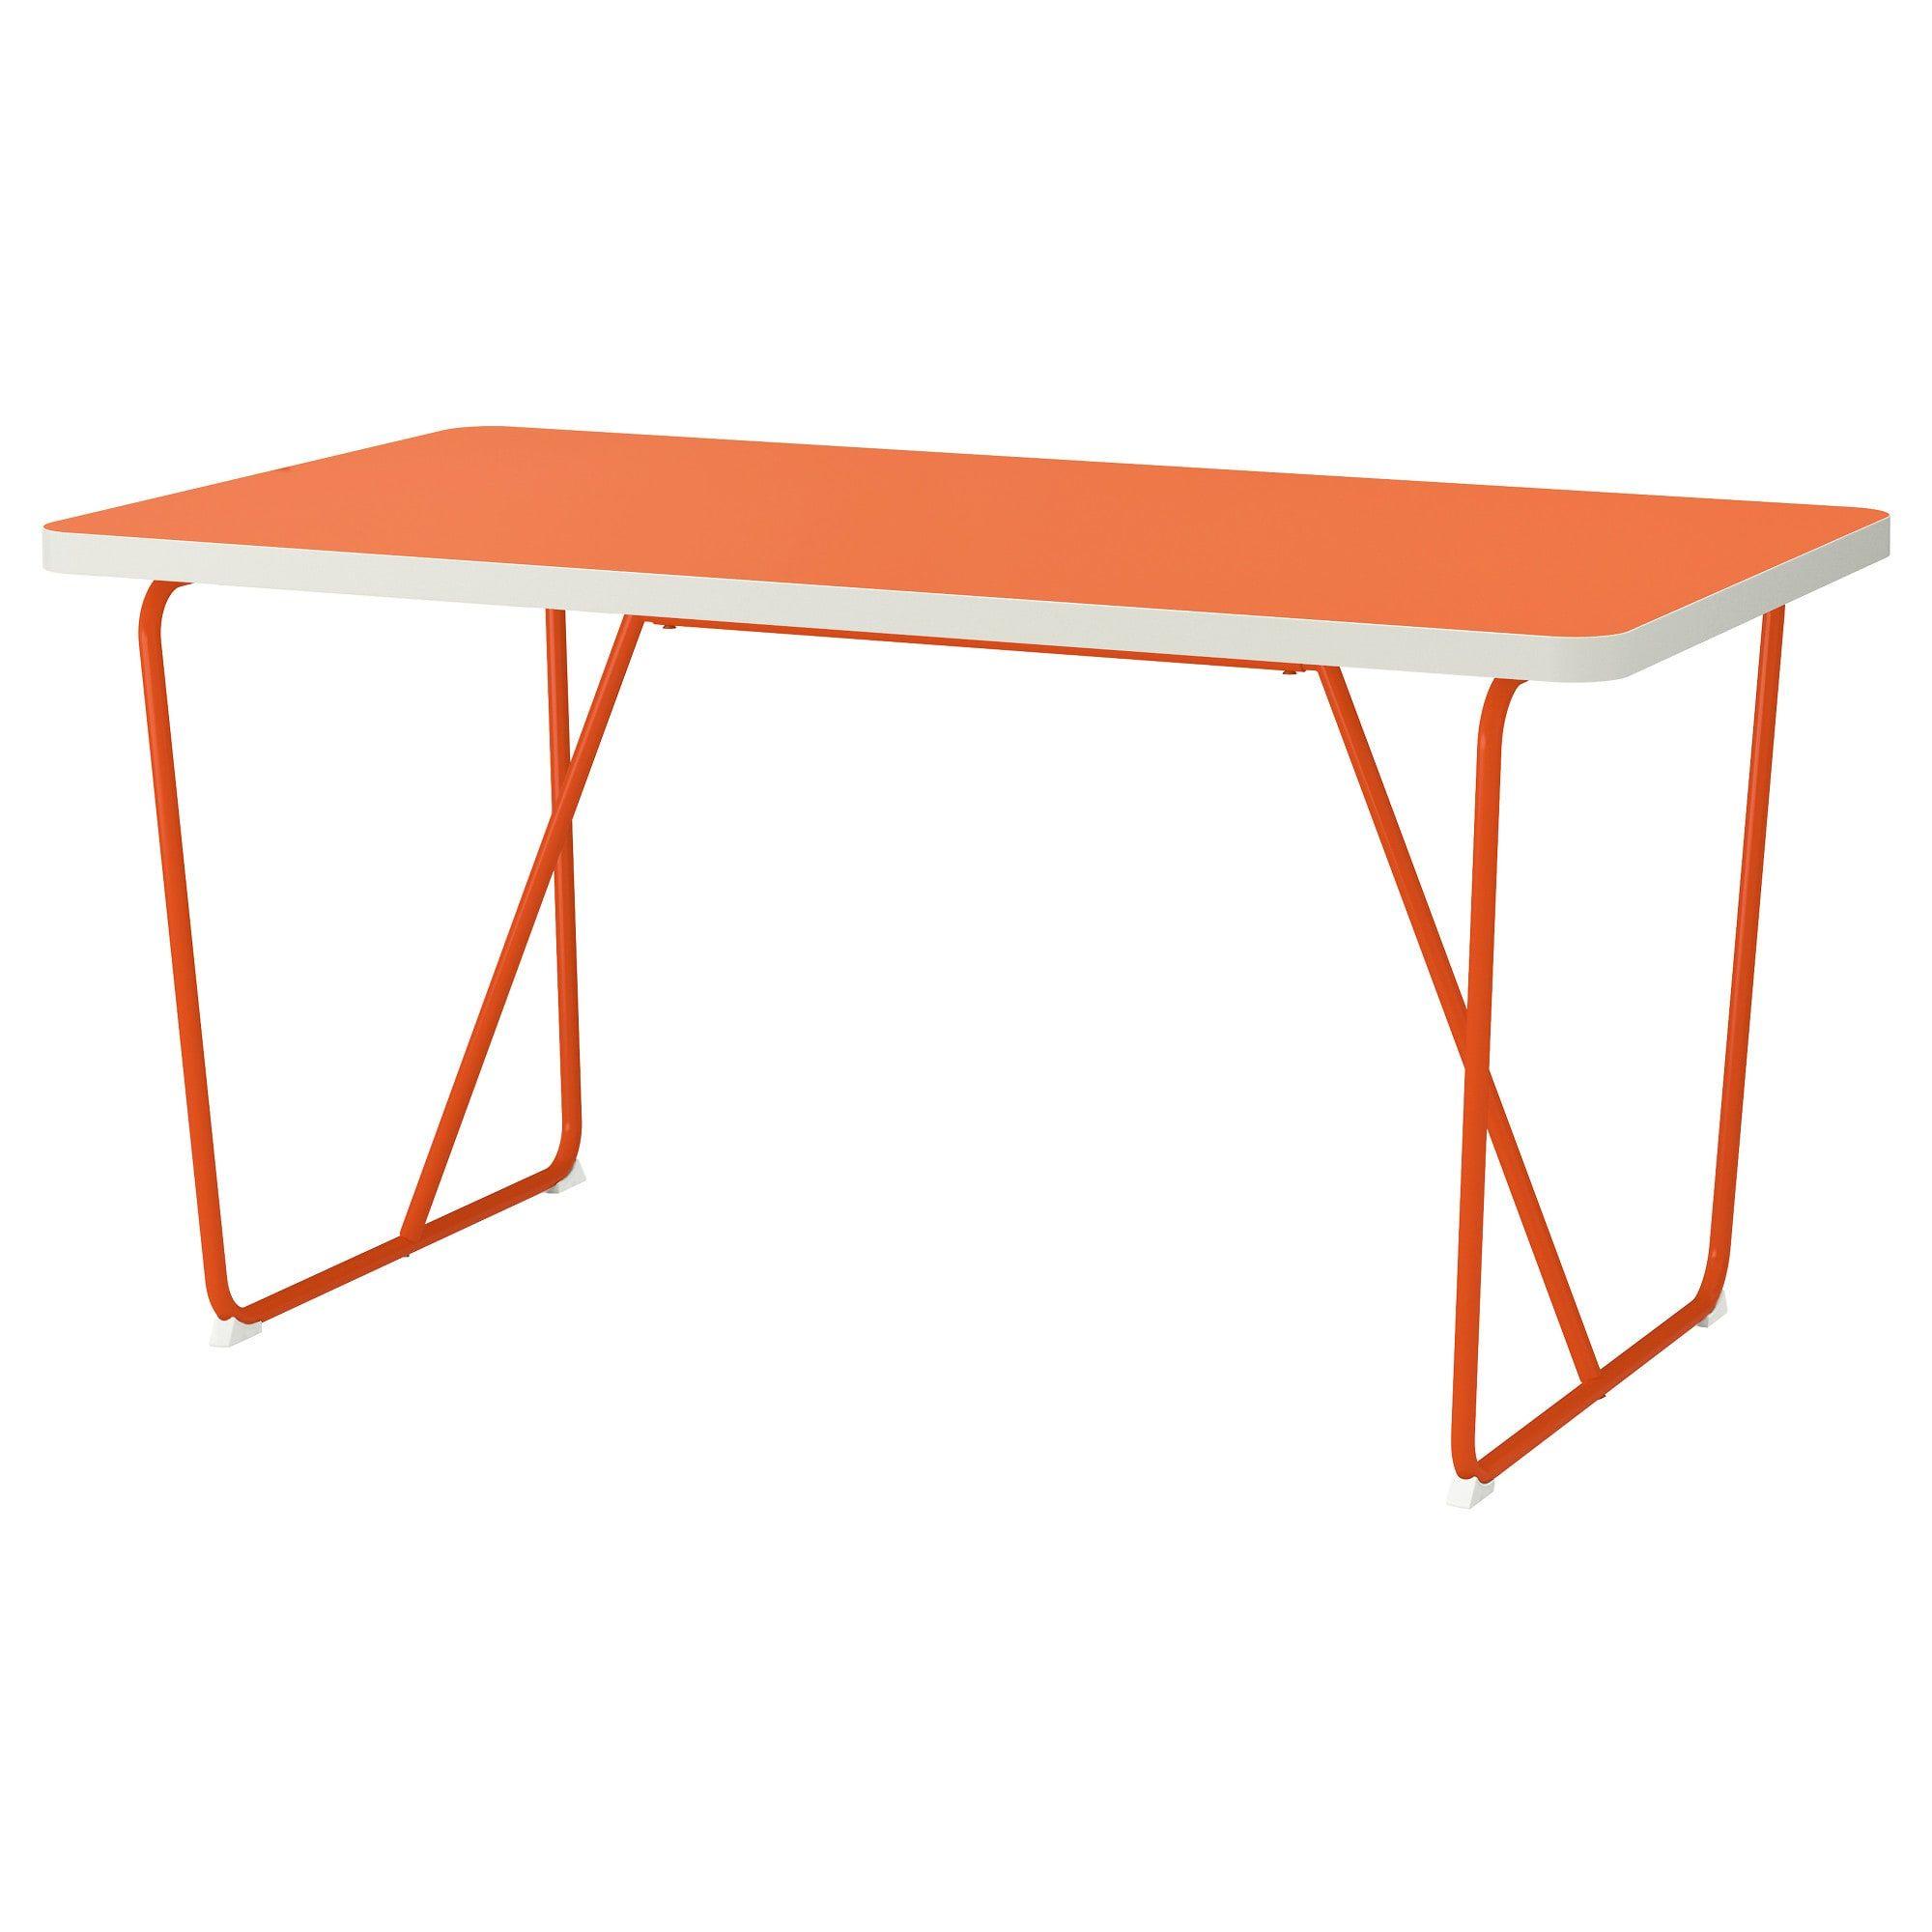 Furniture And Home Furnishings Ikea Dining Ikea Dining Table Ikea